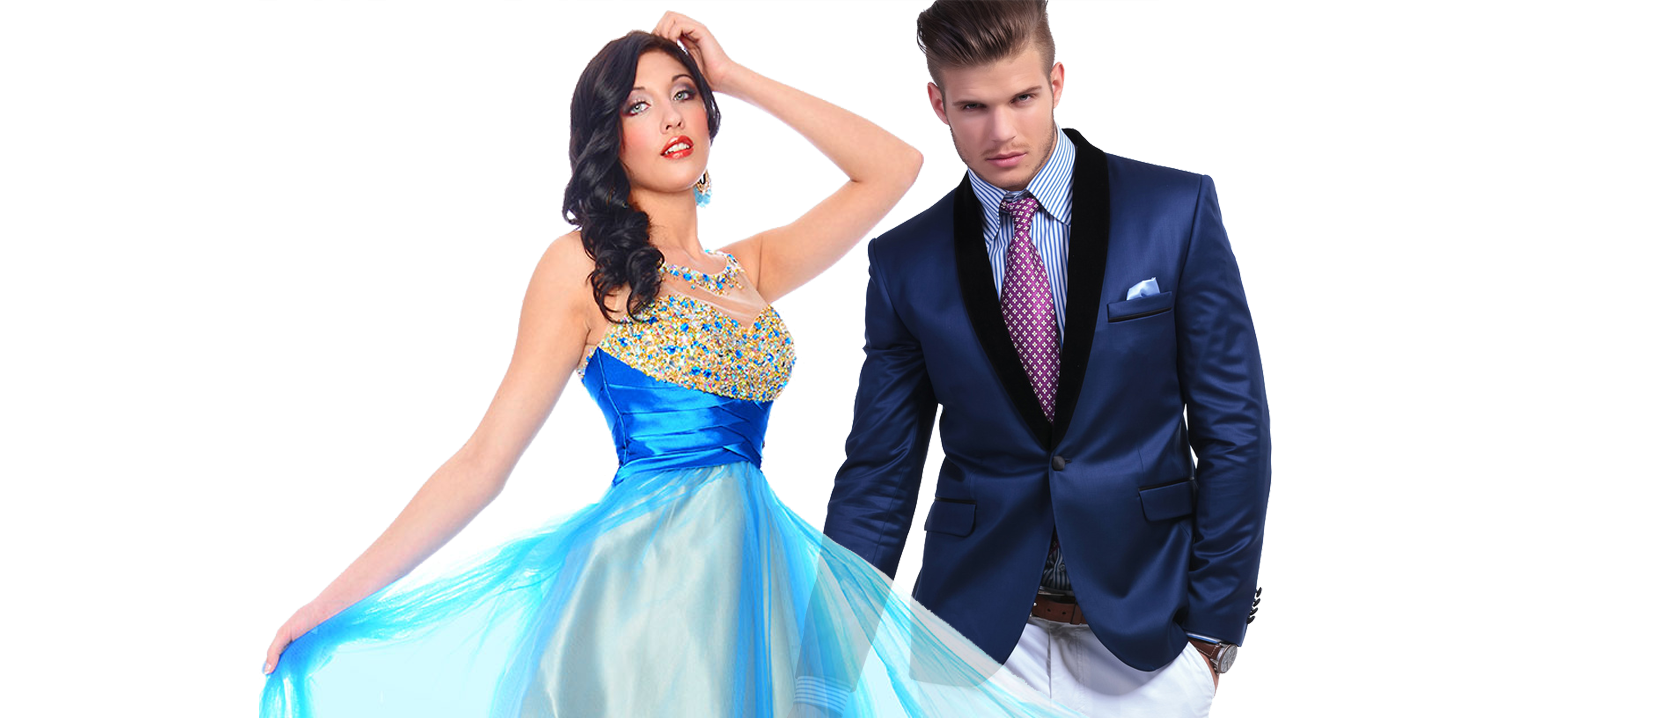 Prom Dresses In Stockton 90